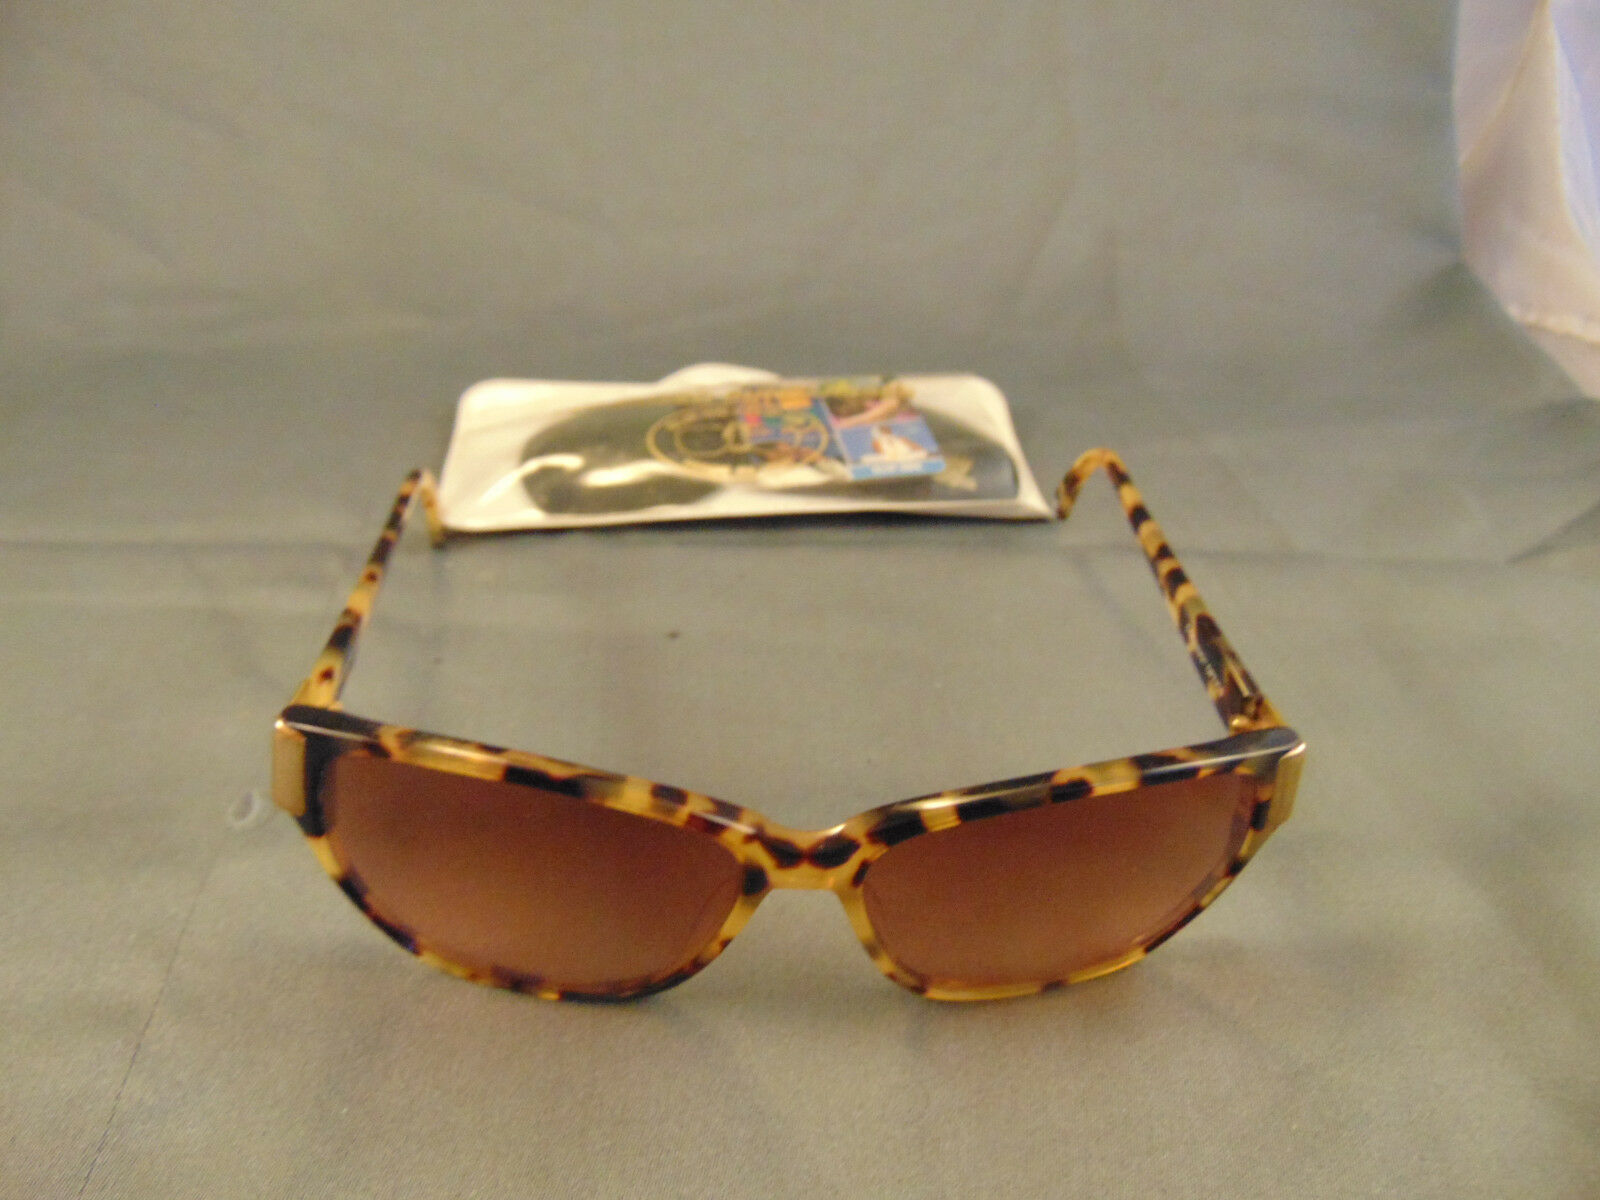 Vtg Lady's sunglasses Corning Optics 625R Family Optics polarized sun clipons